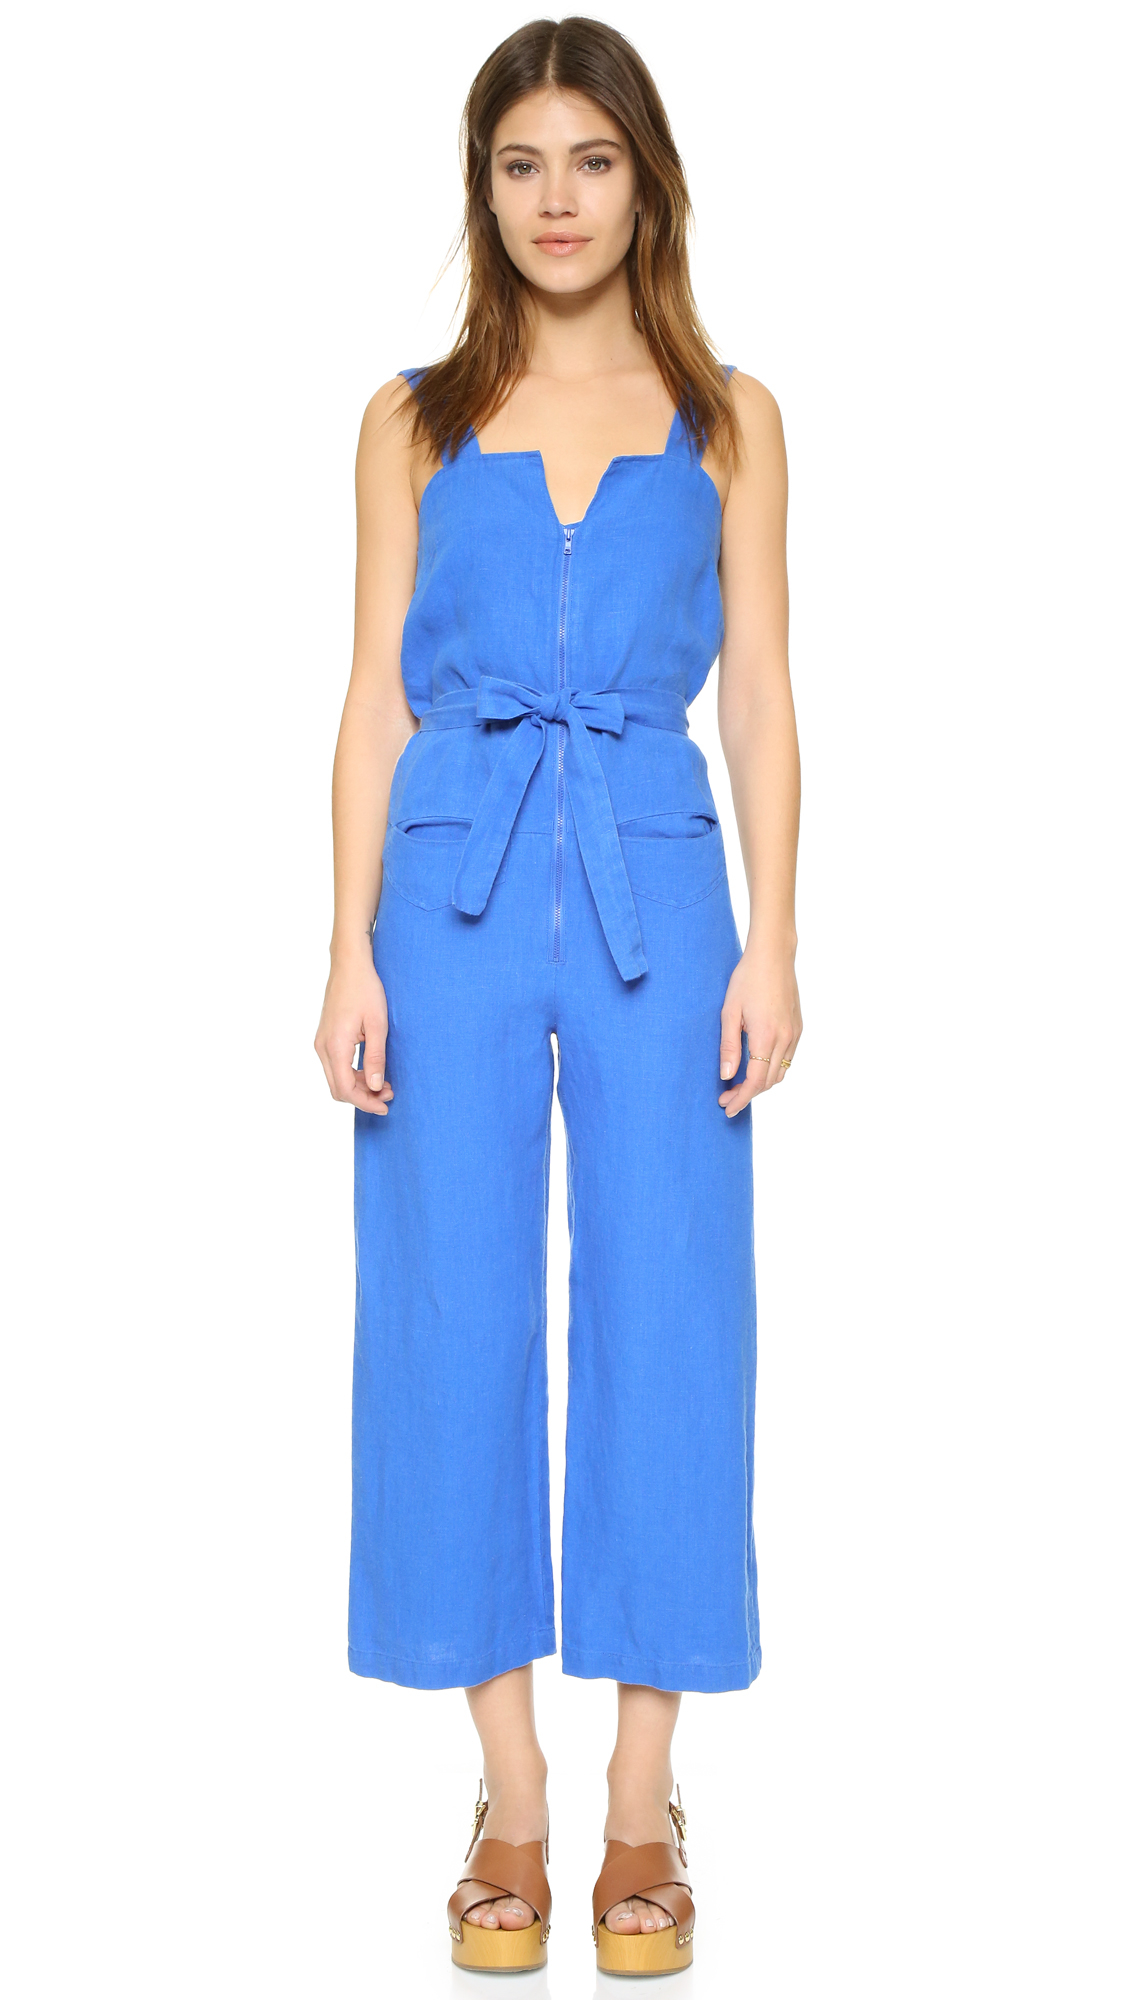 da55755becd Lyst - Rachel Comey Bend Jumpsuit in Blue